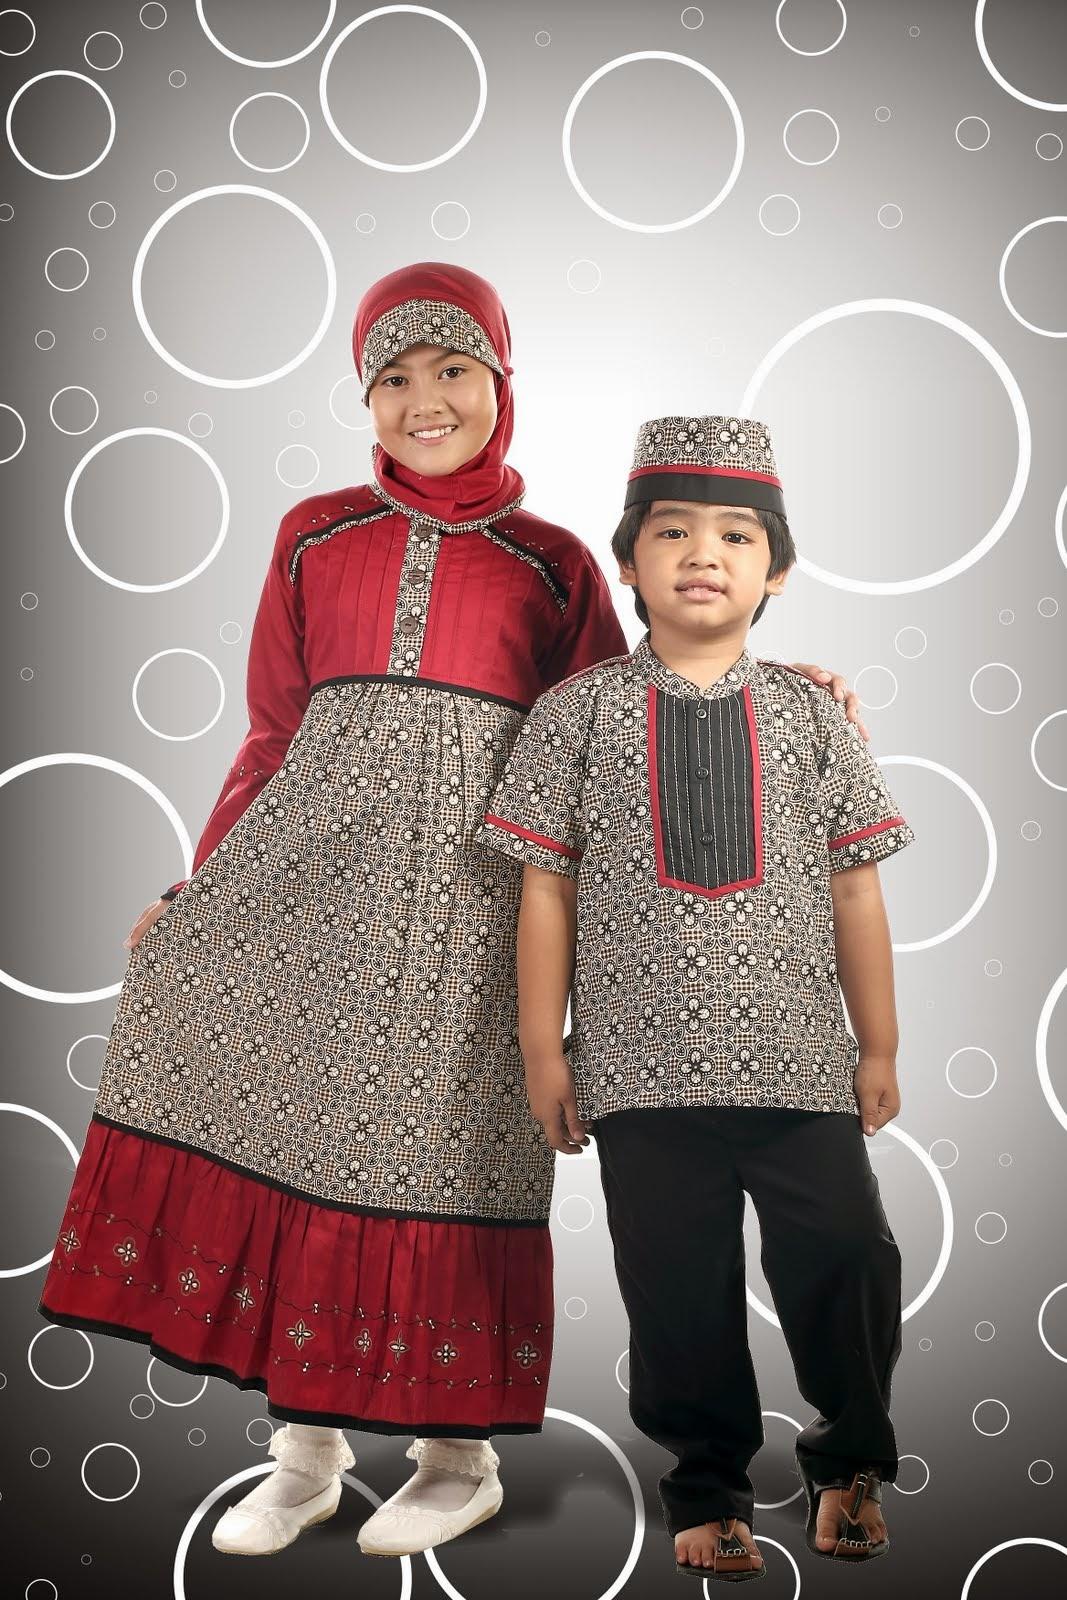 Model baju batik muslim terbaru untuk anak perempuan dan laki-laki